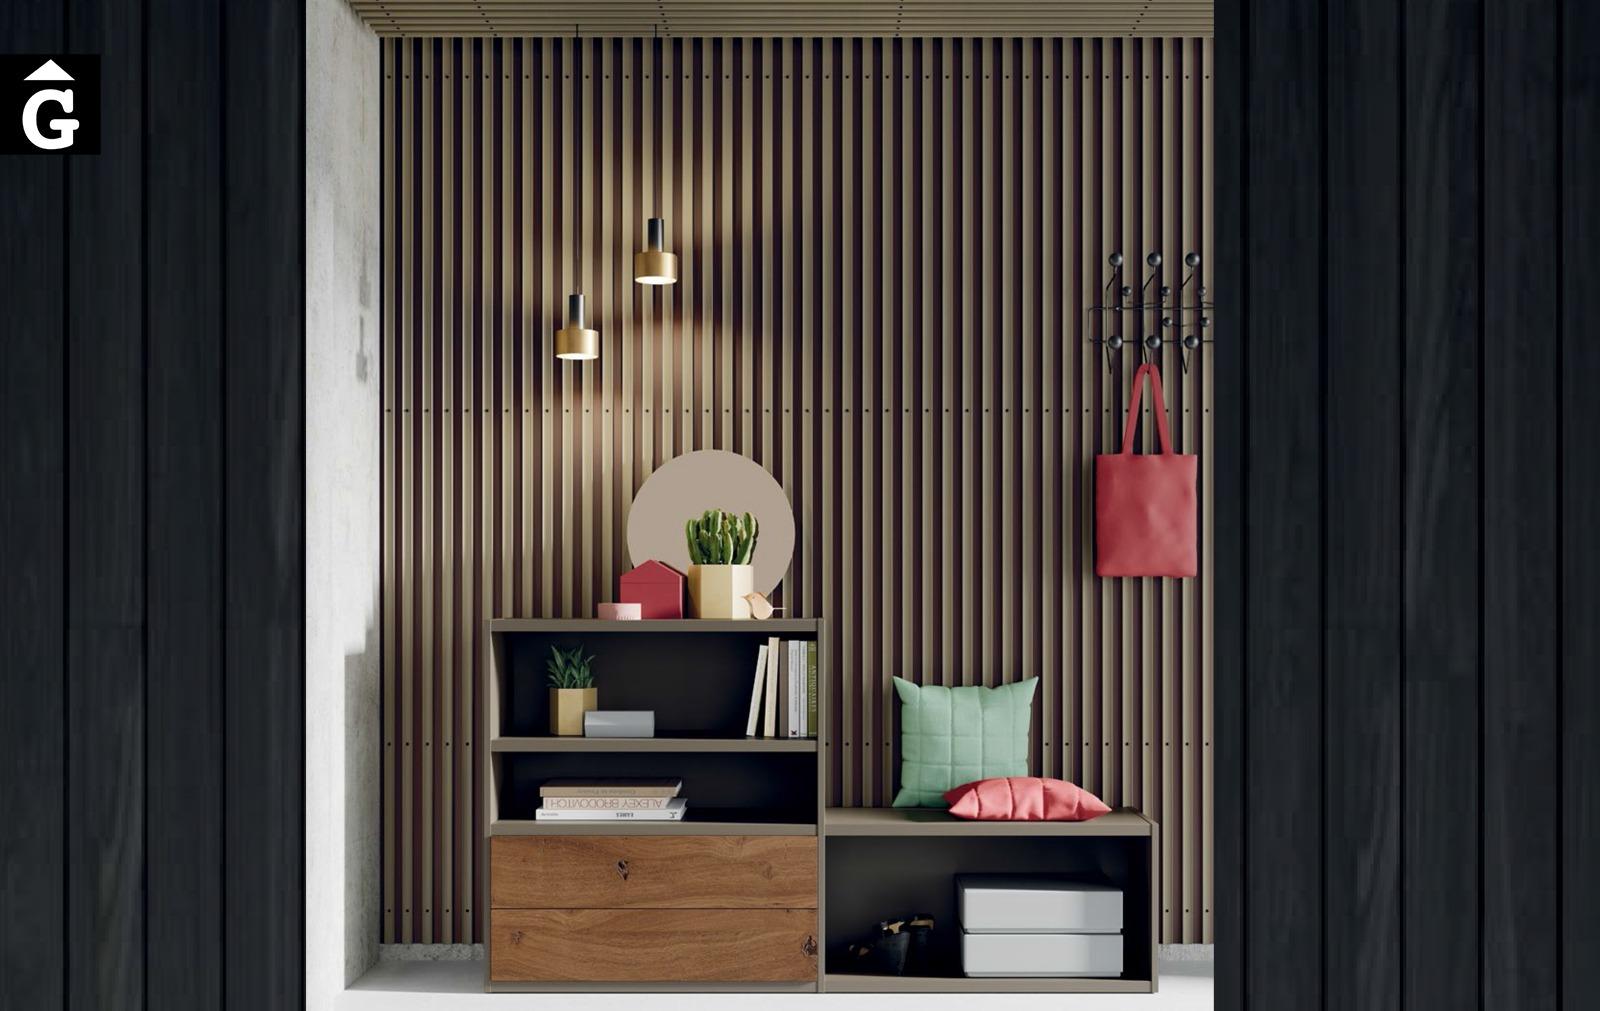 Line moble rebedor ViVe muebles Verge programa llibrera llibreries living by mobles Gifreu